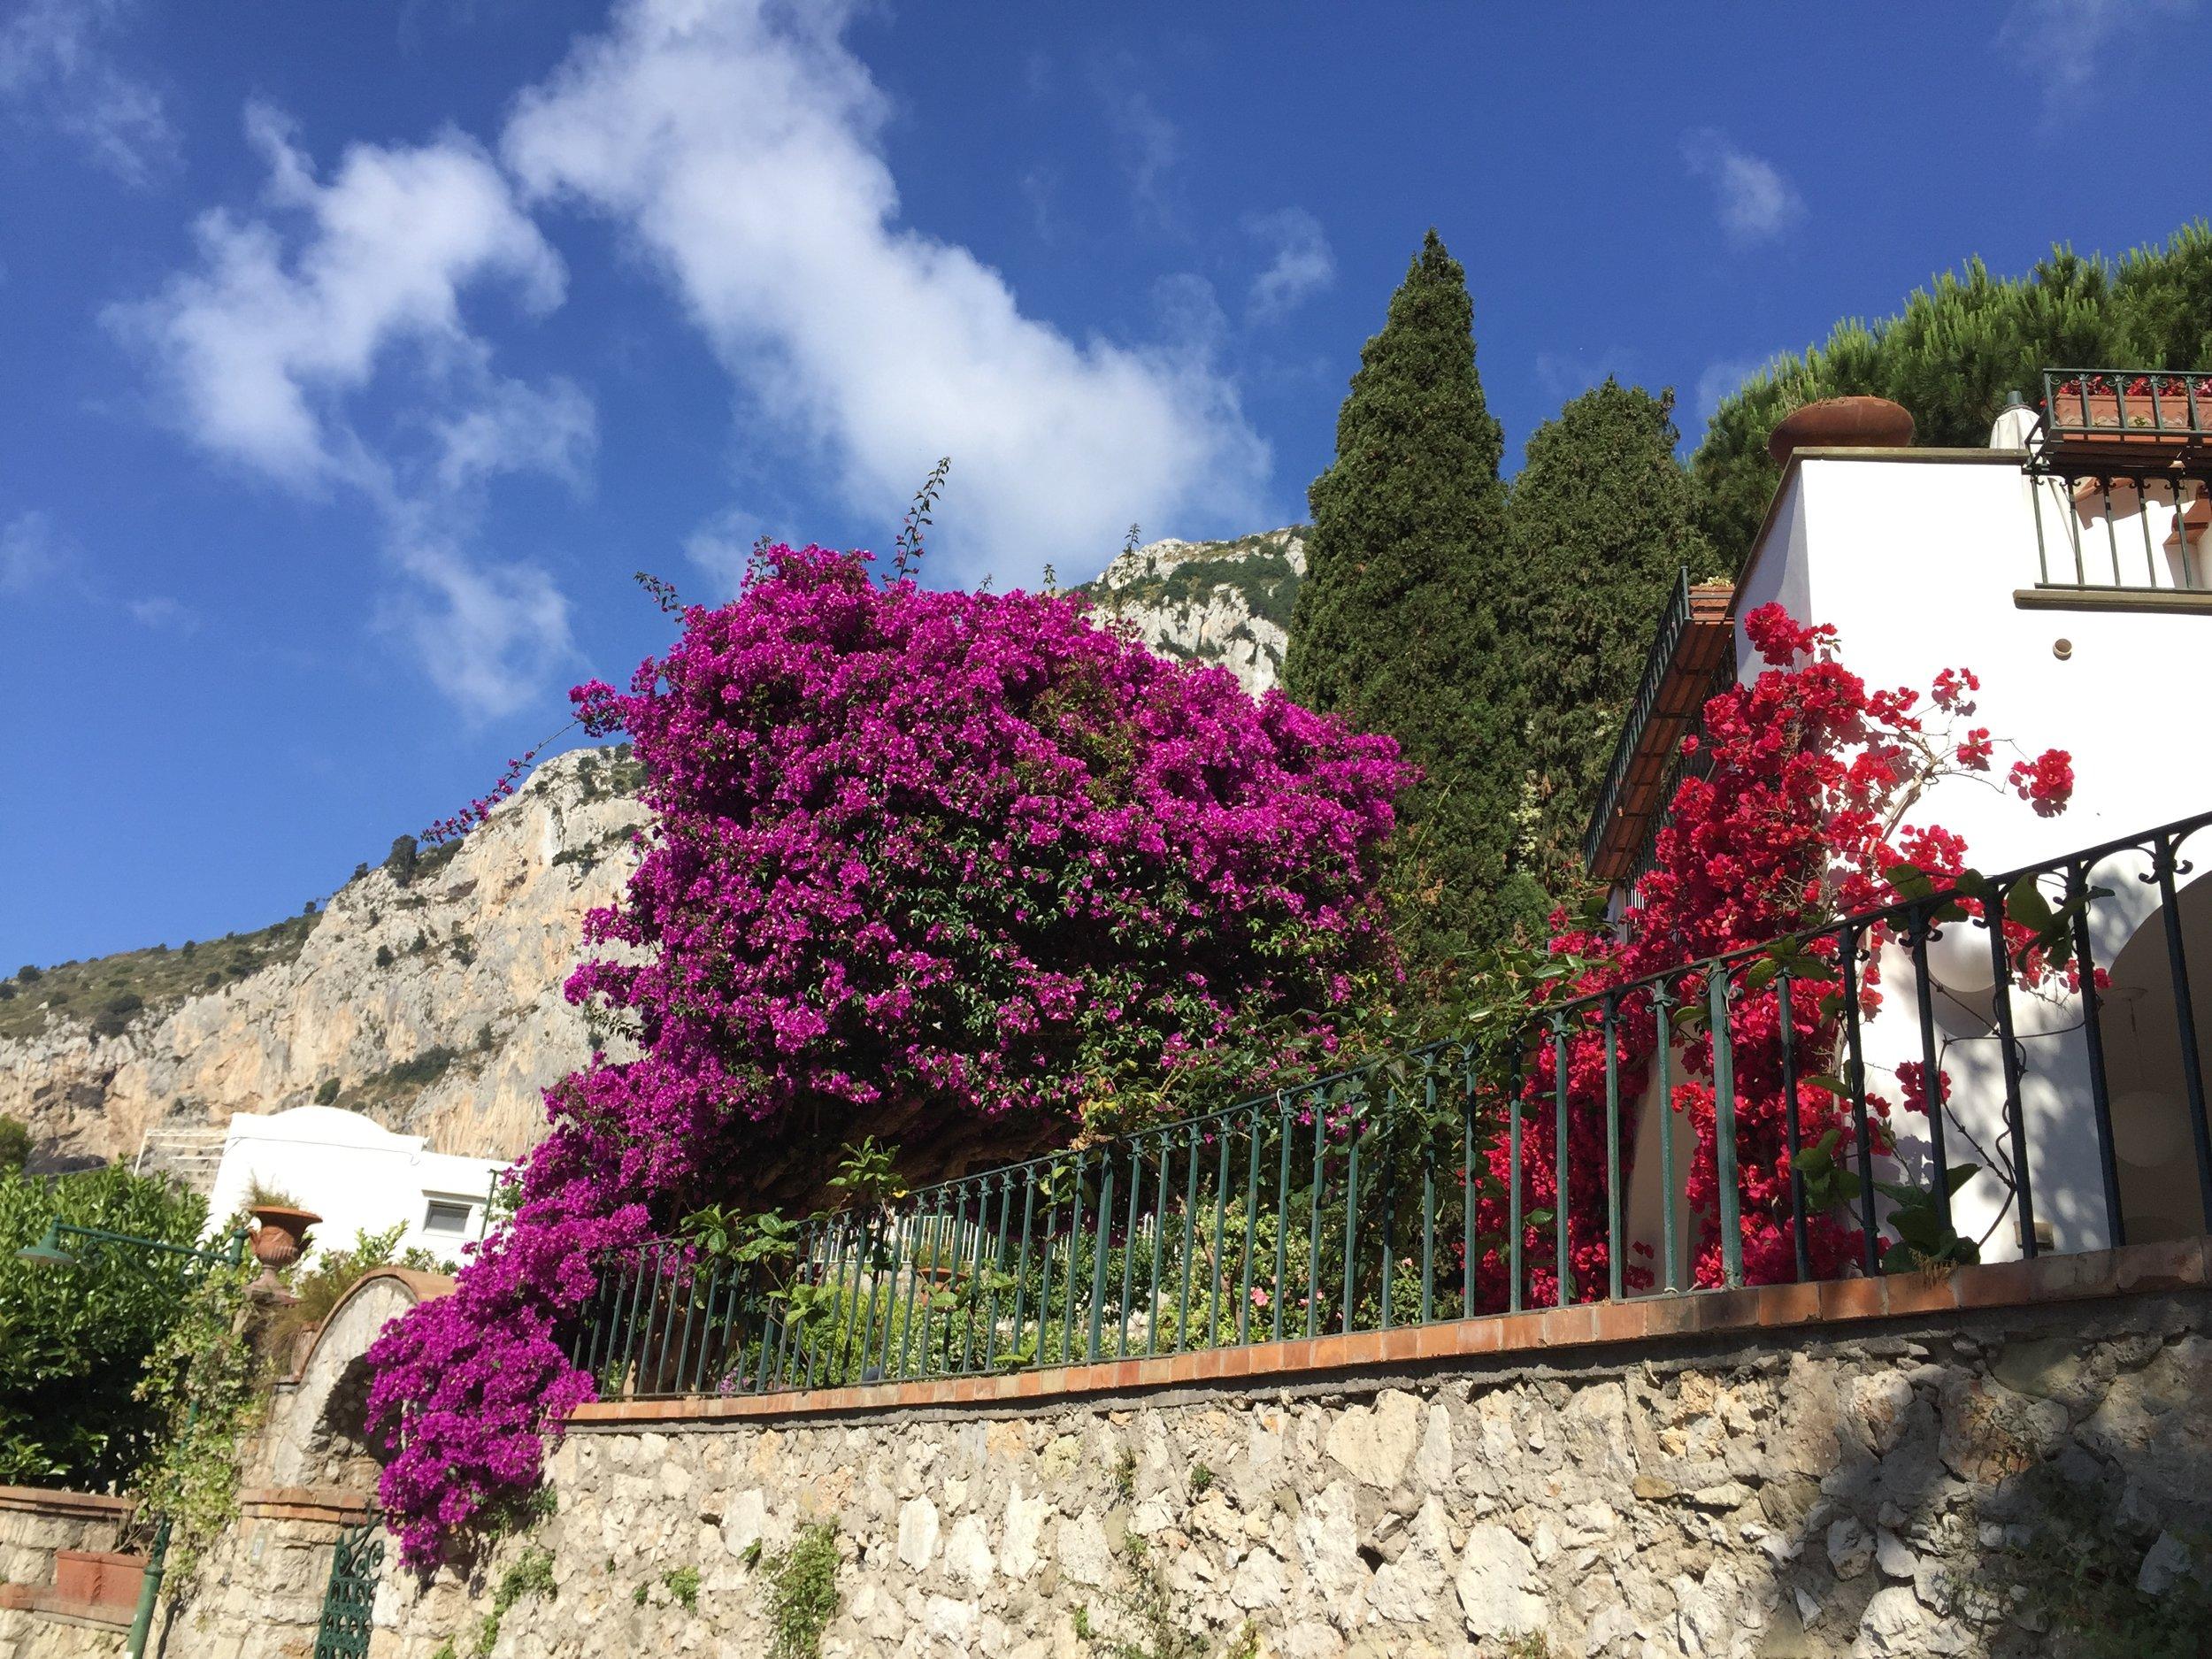 Flowers in Capri